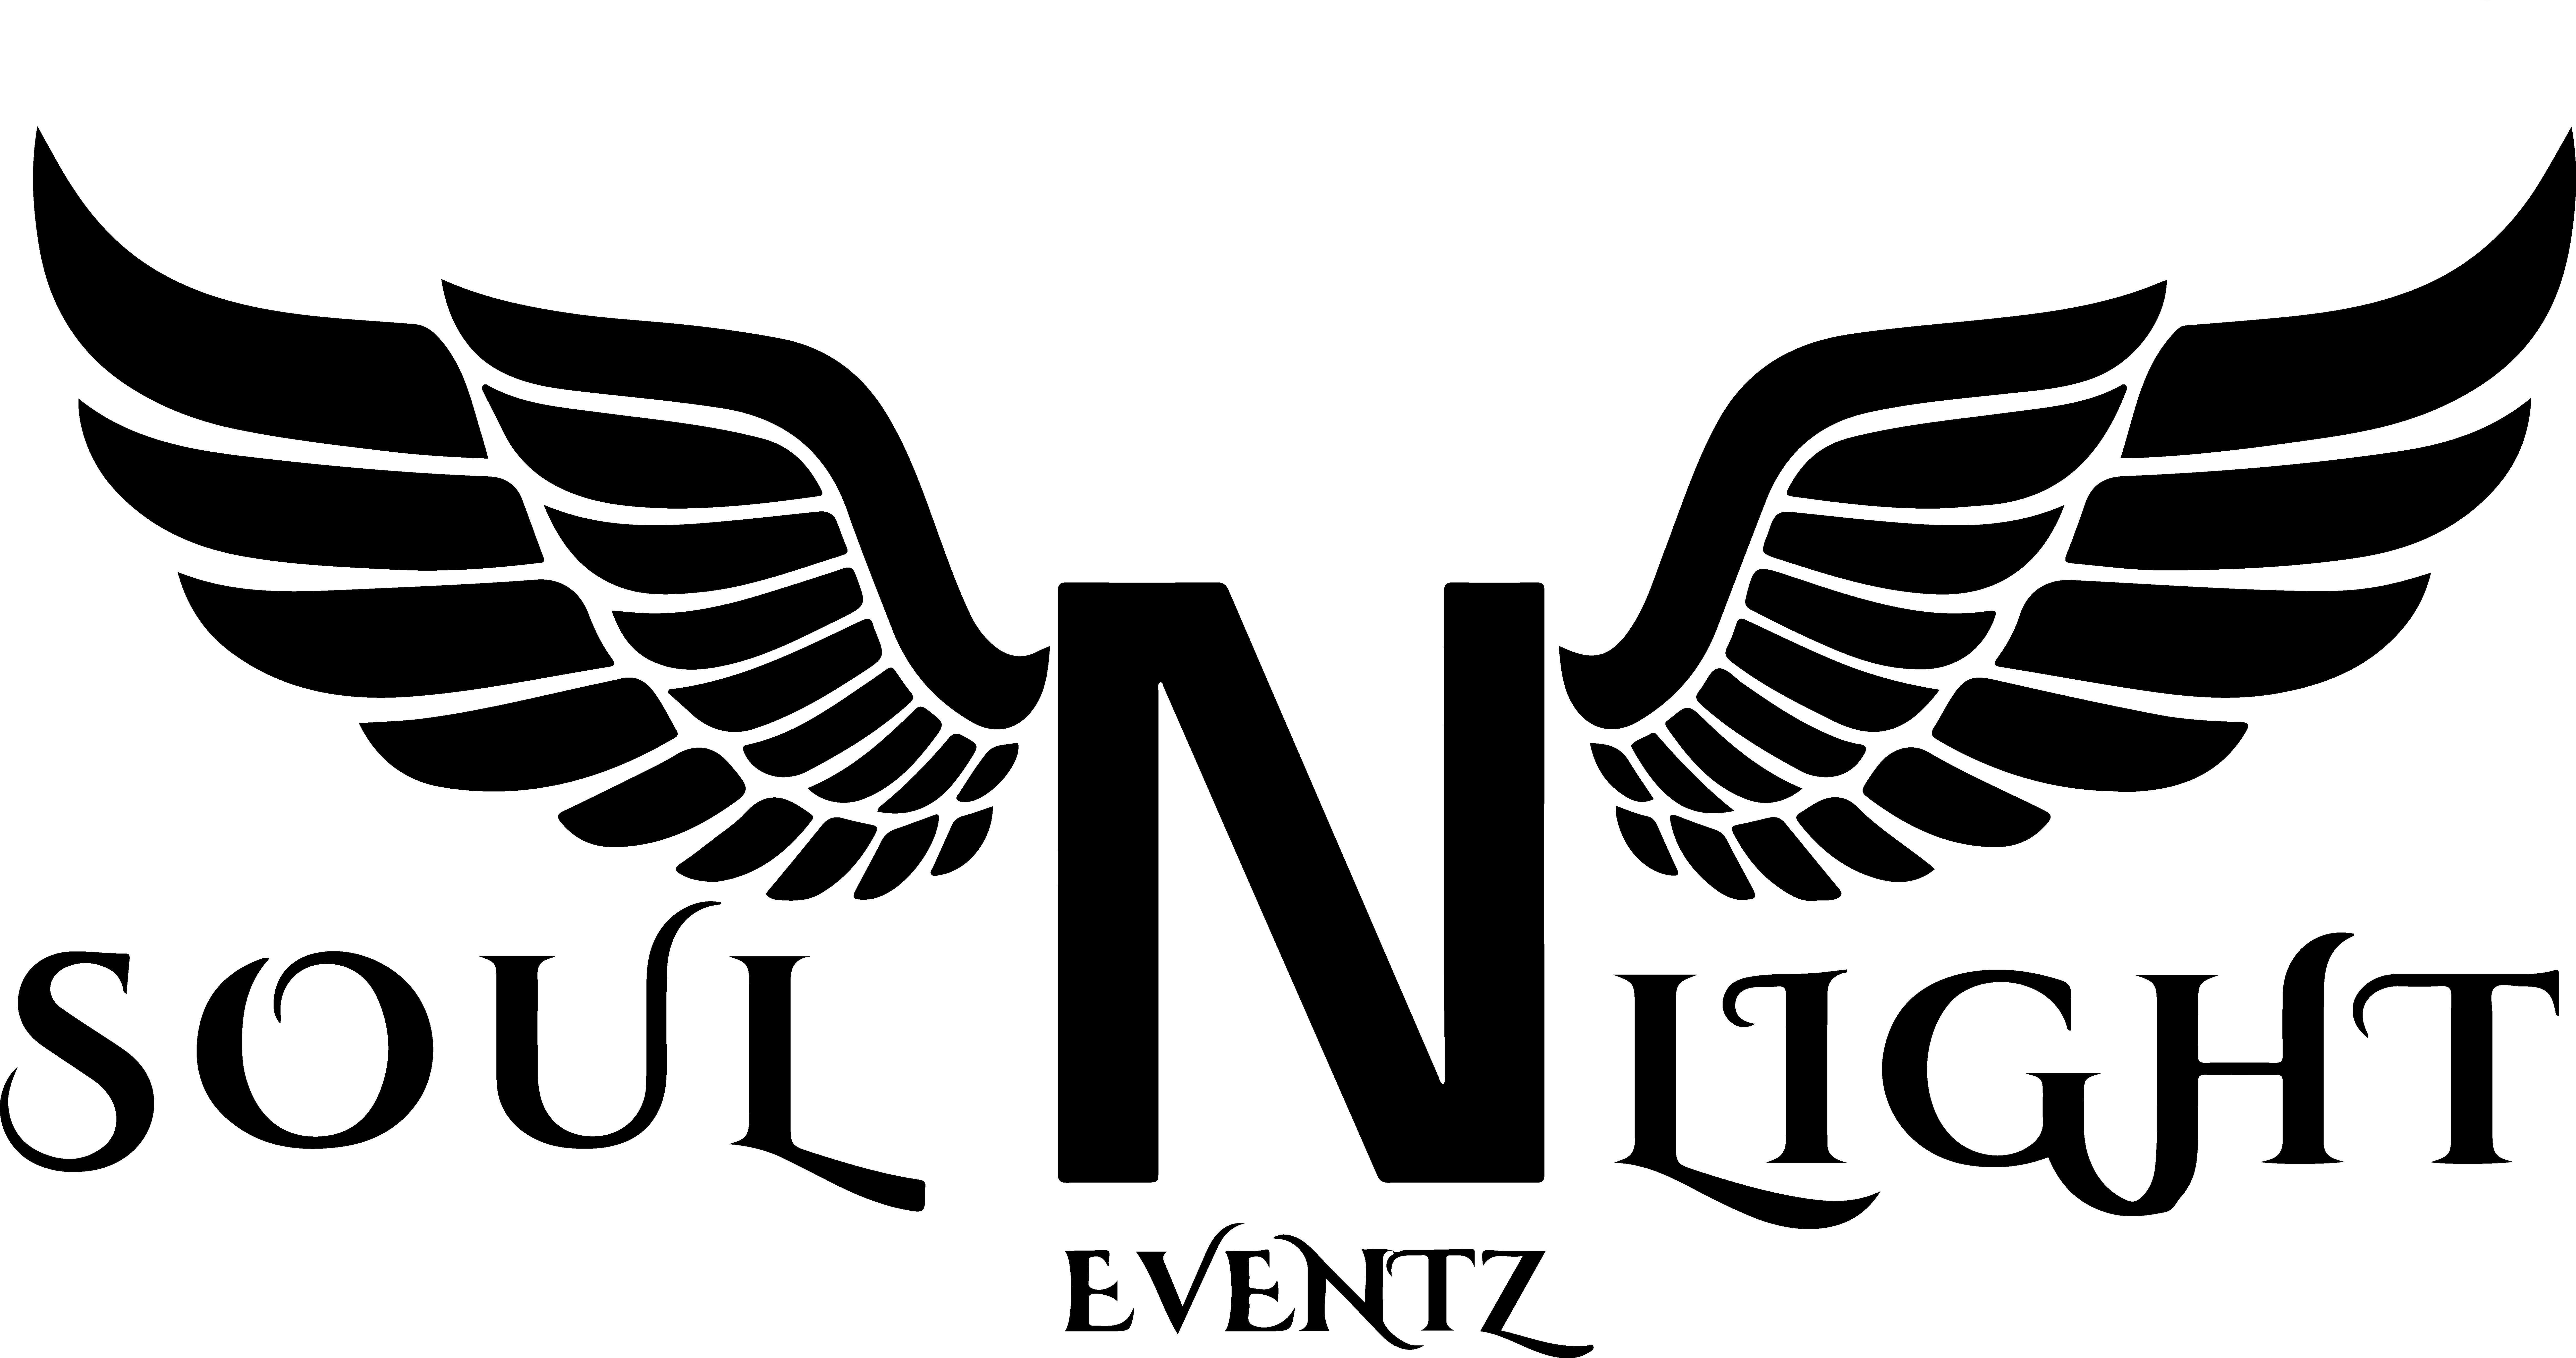 Soul n Light Eventz & Tours